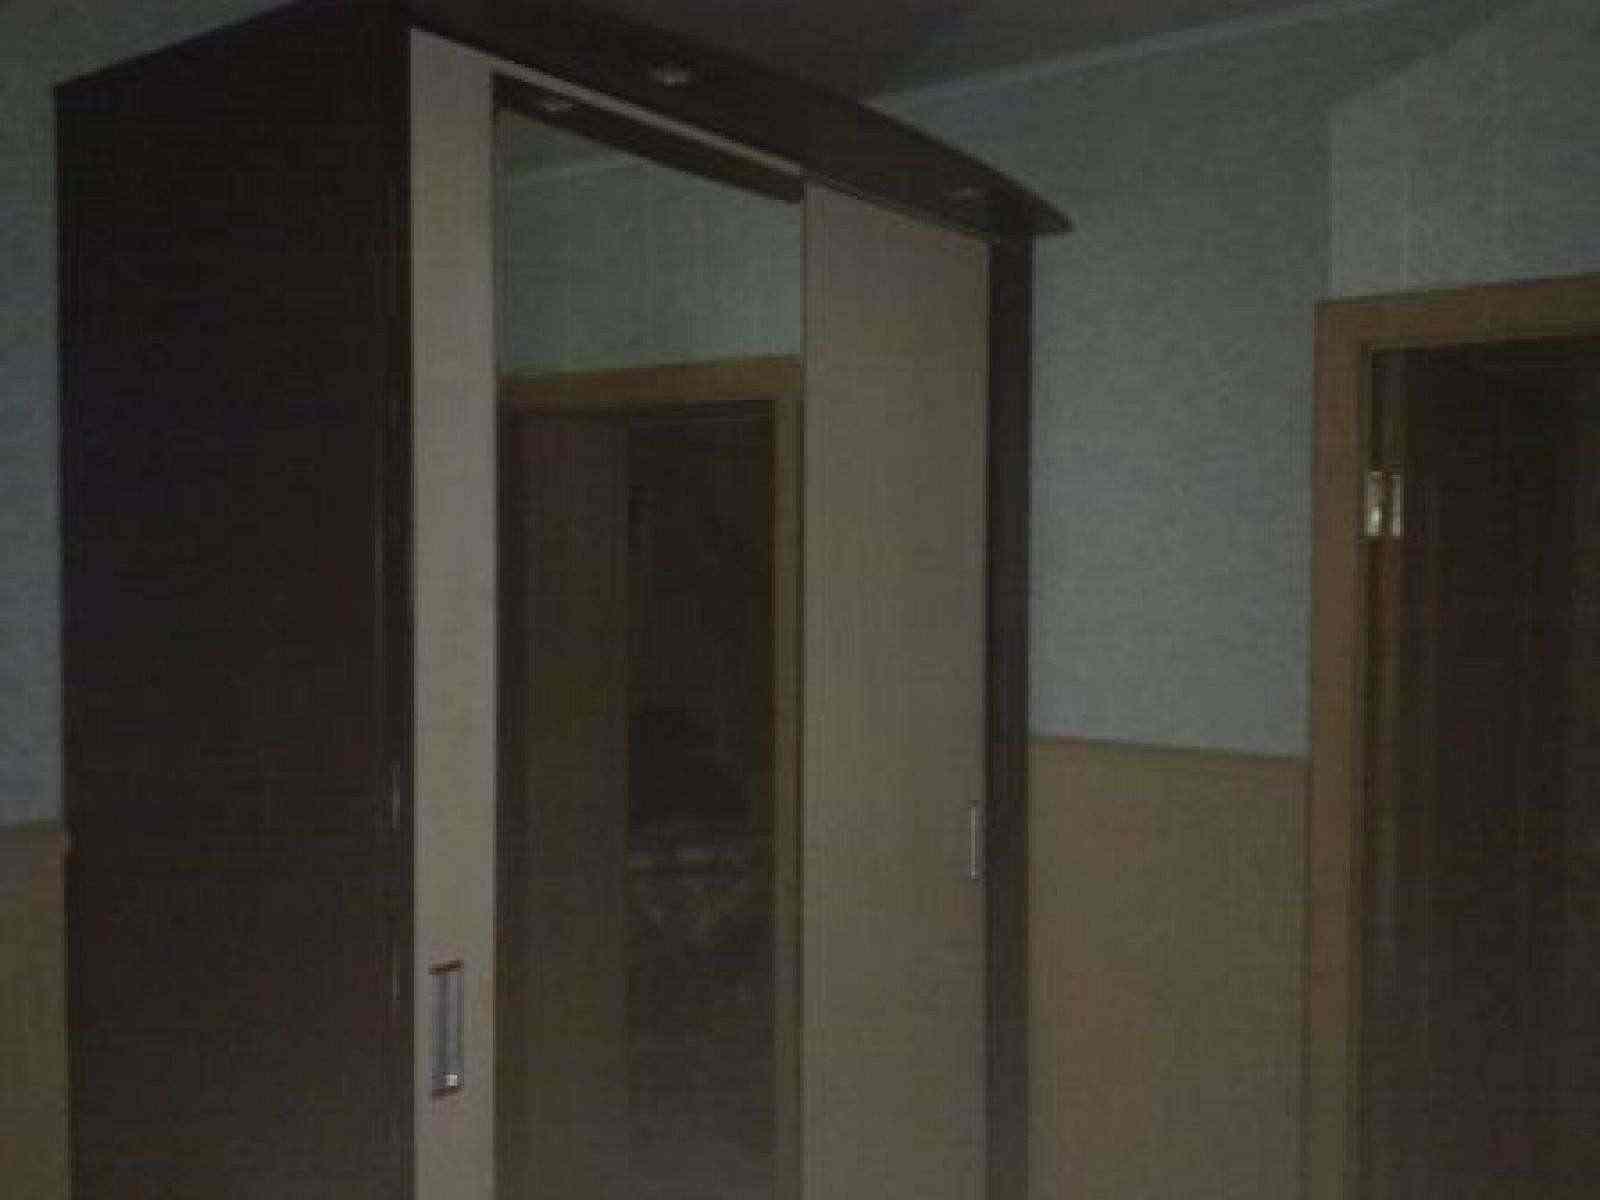 квартира 3х комнатная с мебелью. Фото